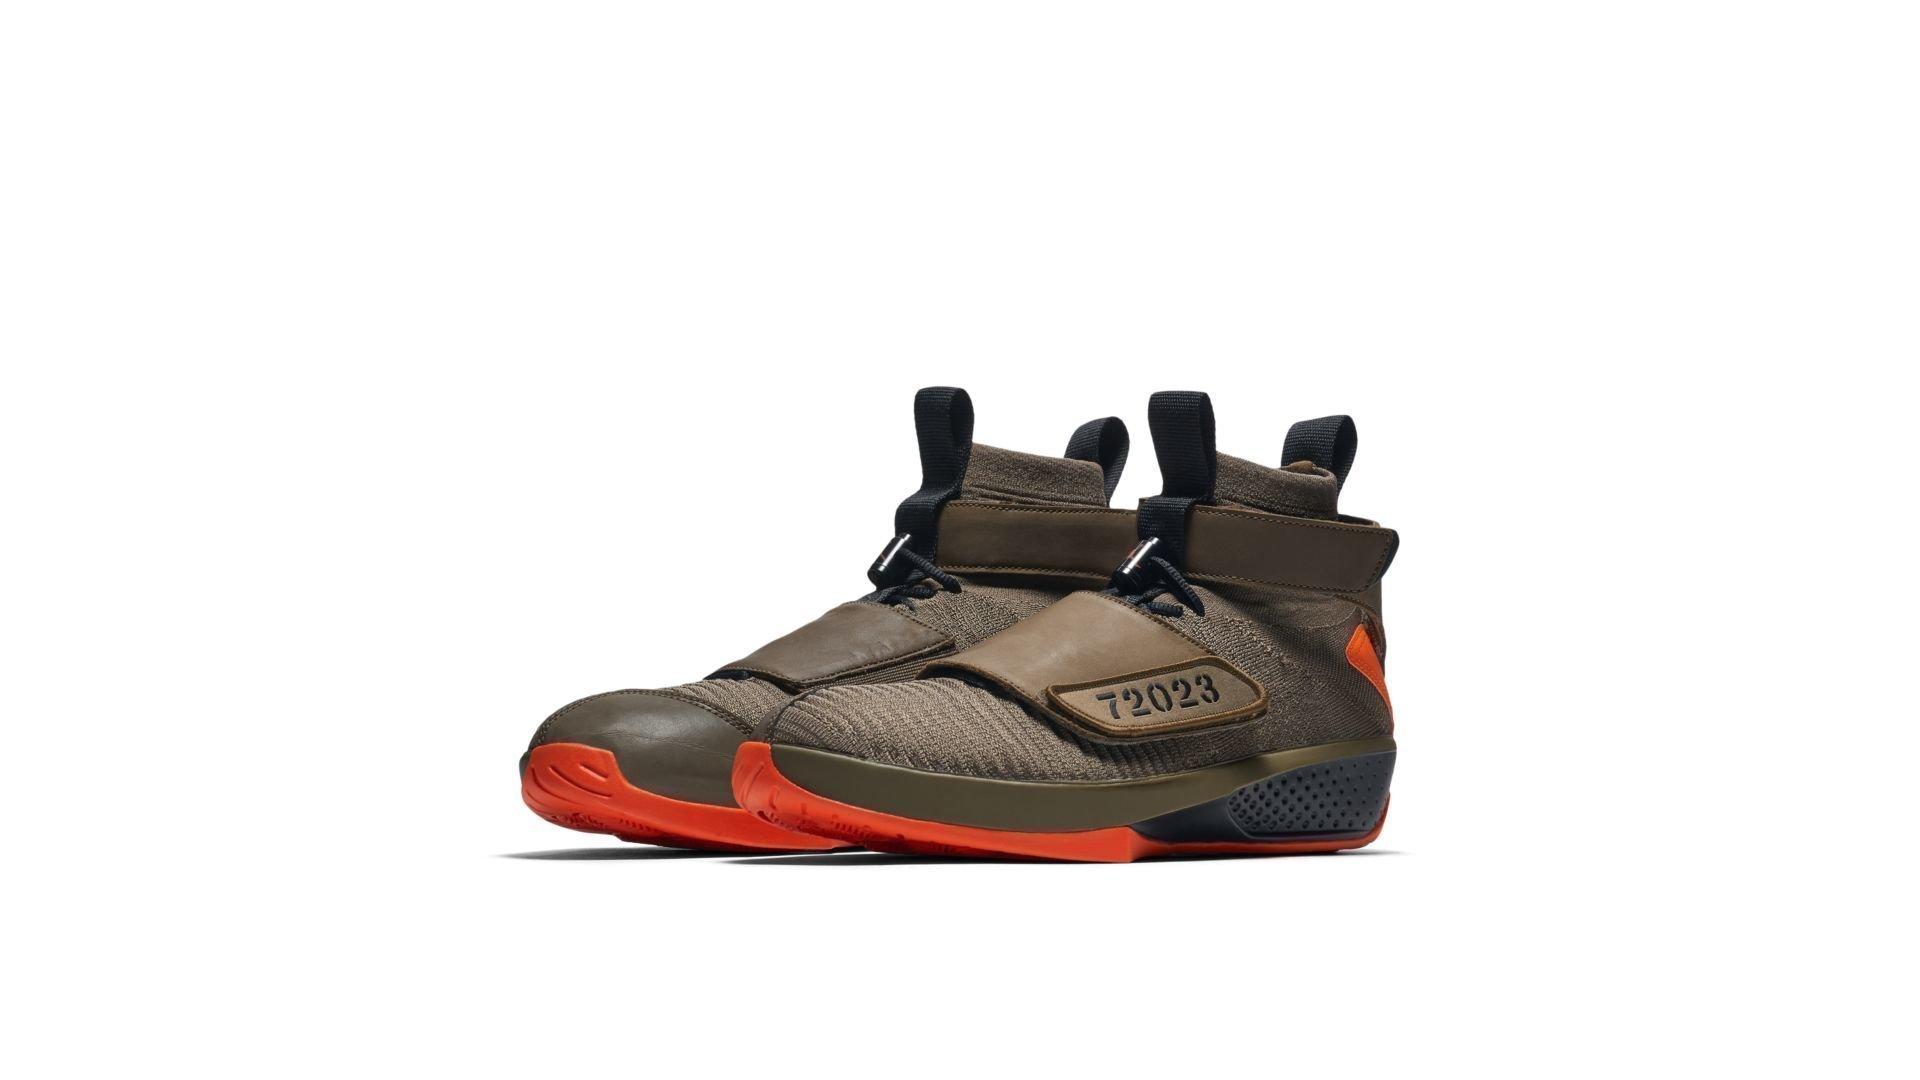 Jordan XX Flyknit R&B Melo Olive (BQ3271-200)